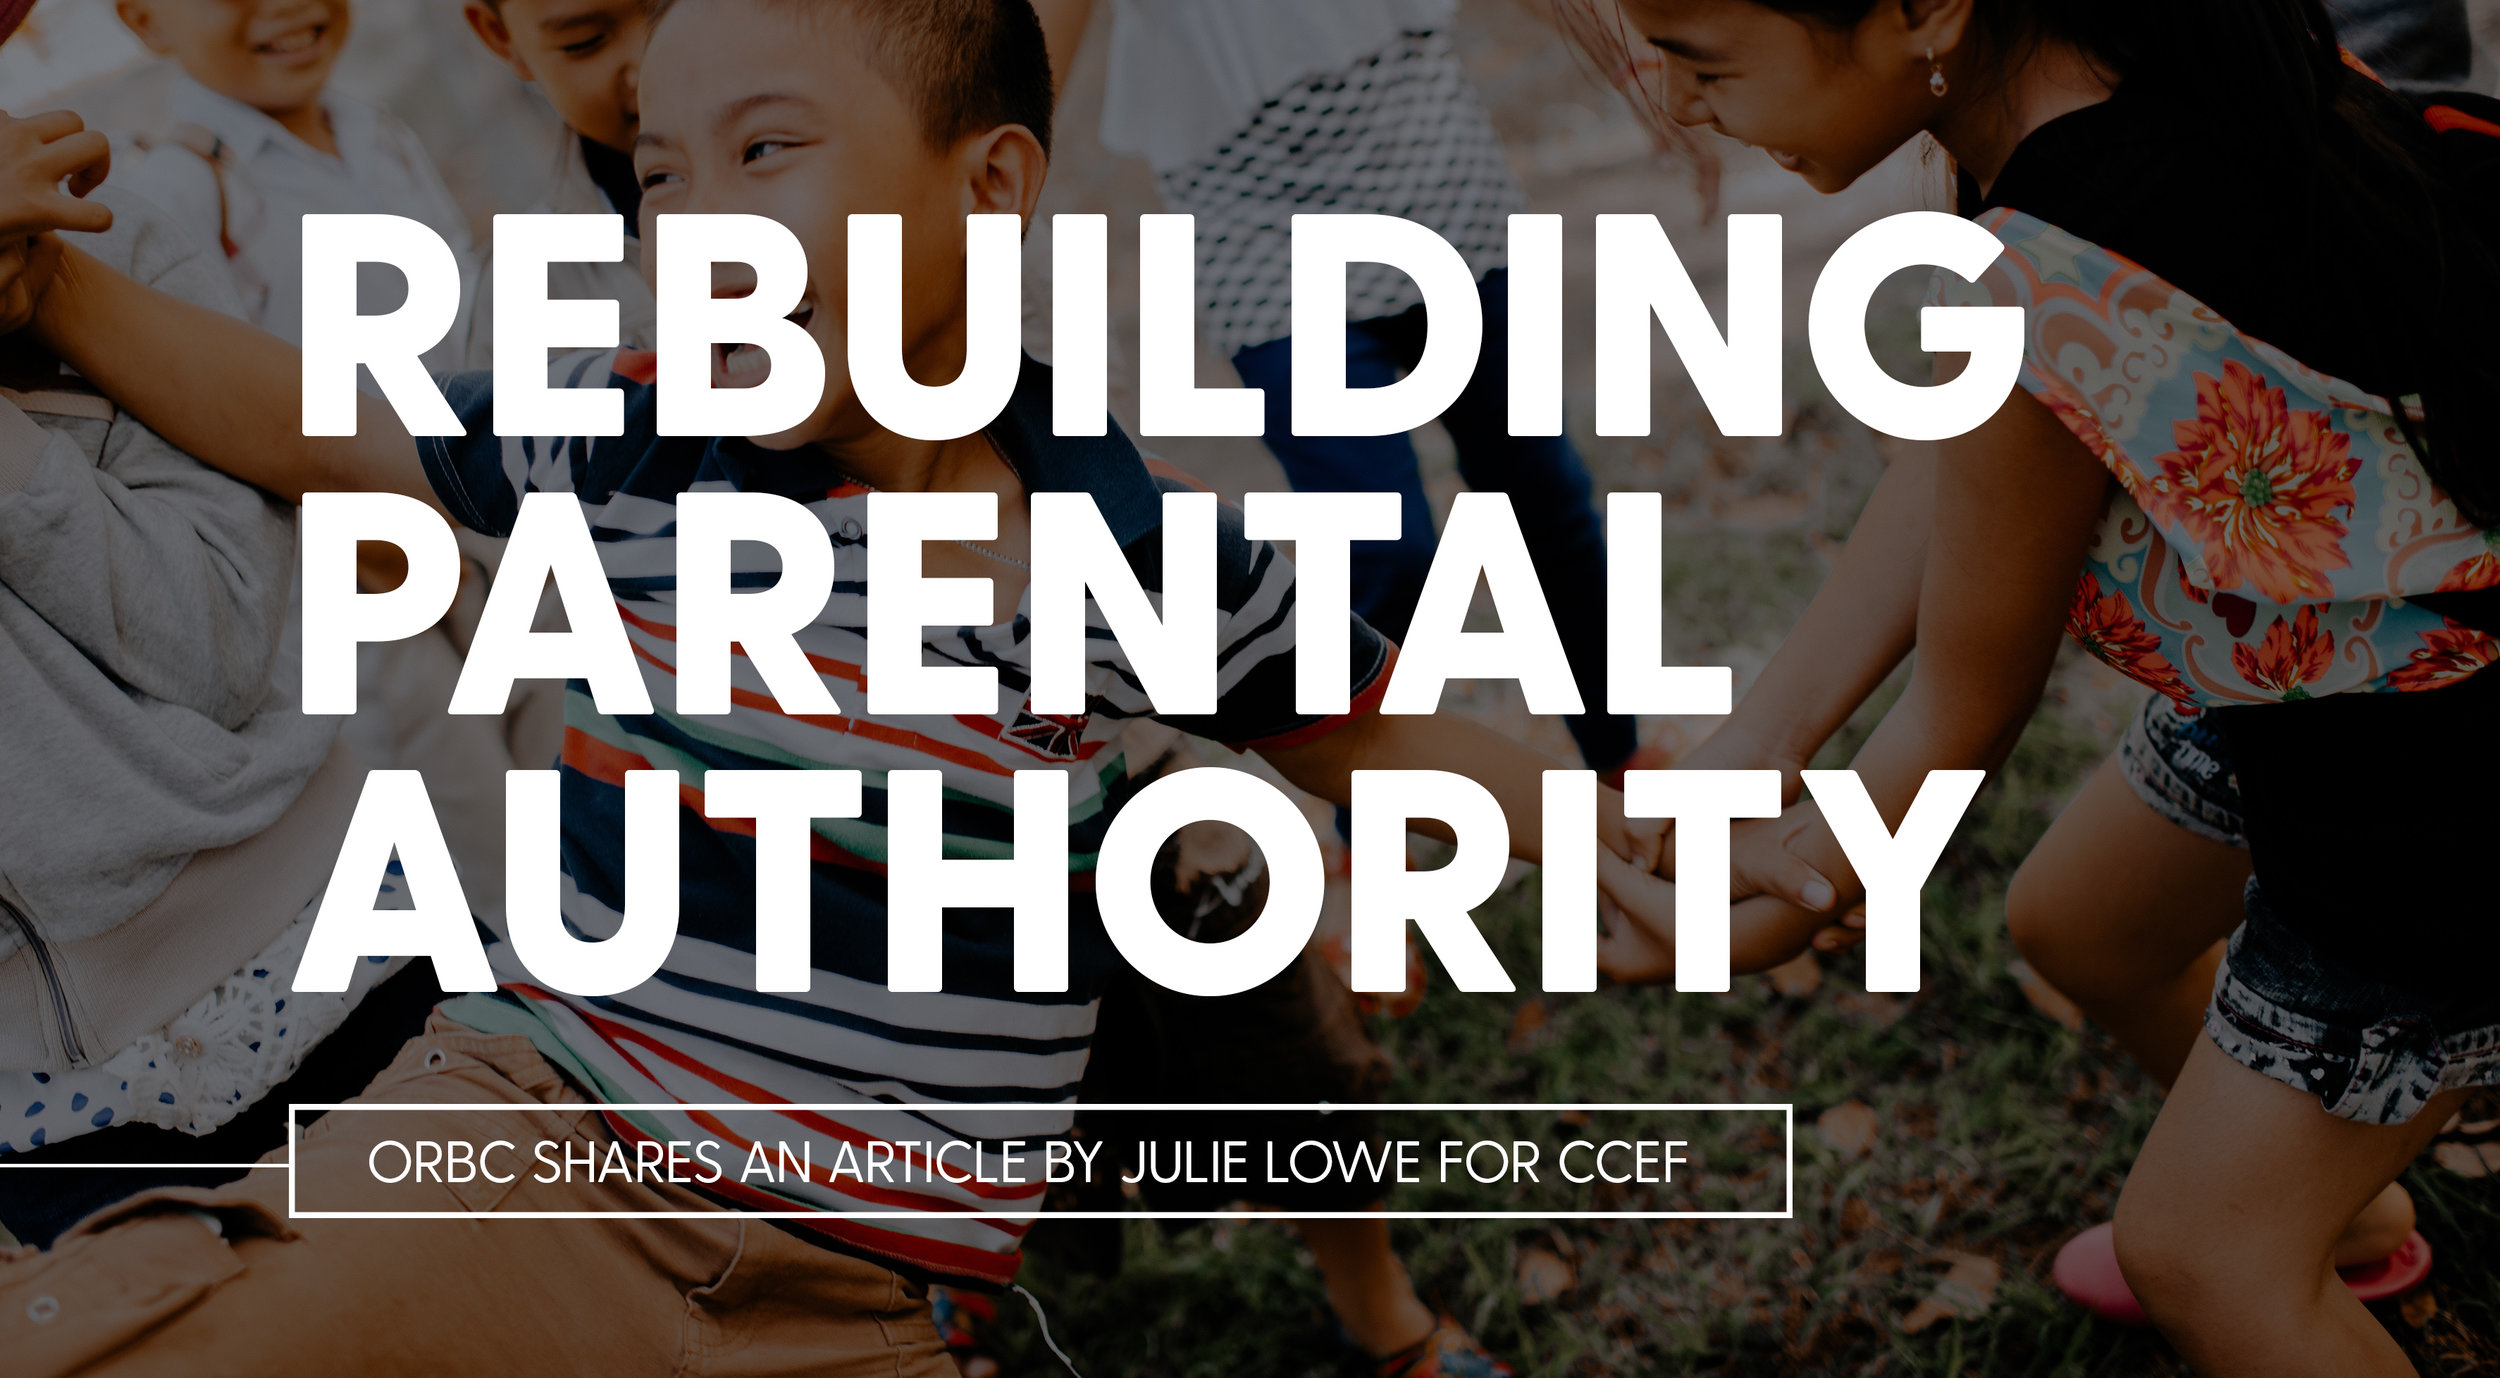 Rebuilding Parental Authority.jpg